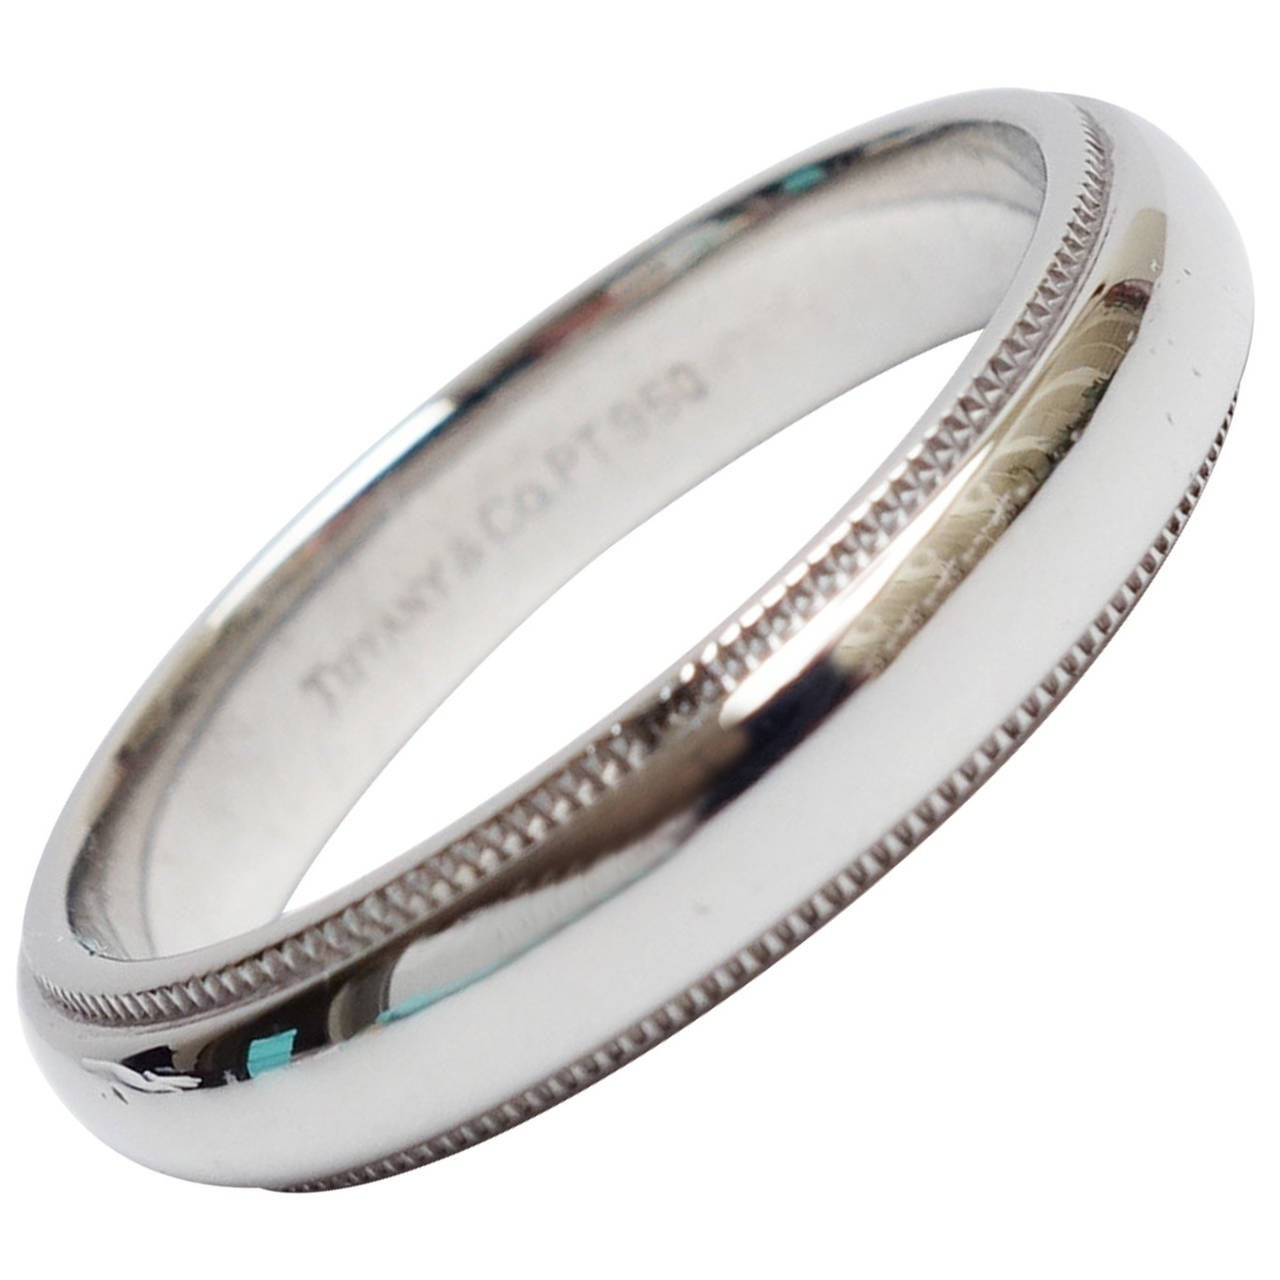 Tiffany And Co. Platinum Milgrain Wedding Band Ring At 1stdibs